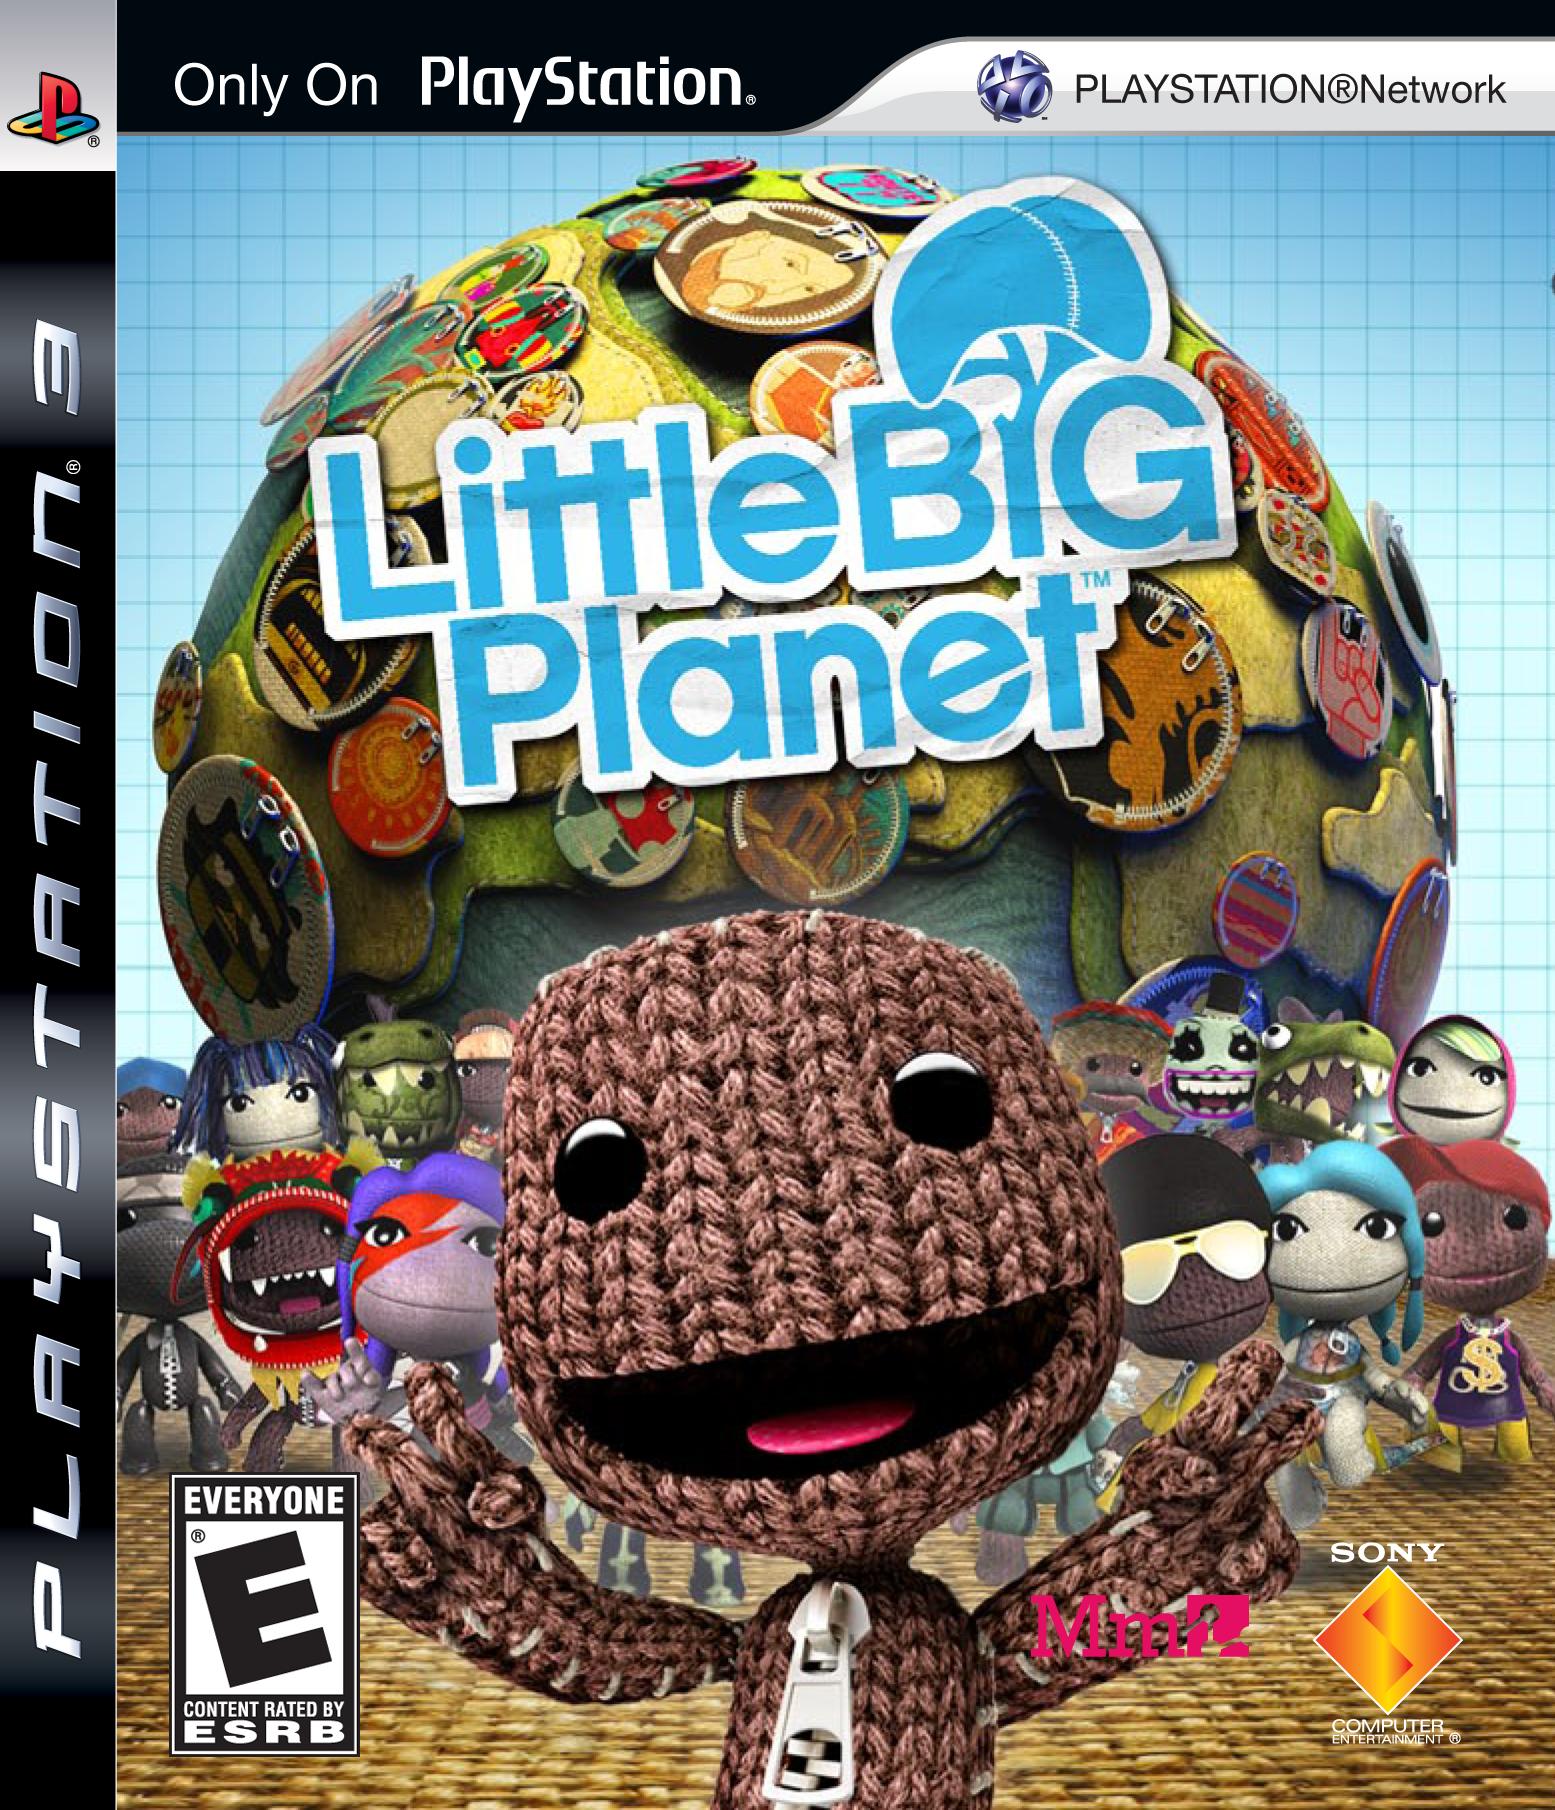 littlebigplanet-official-us-boxart